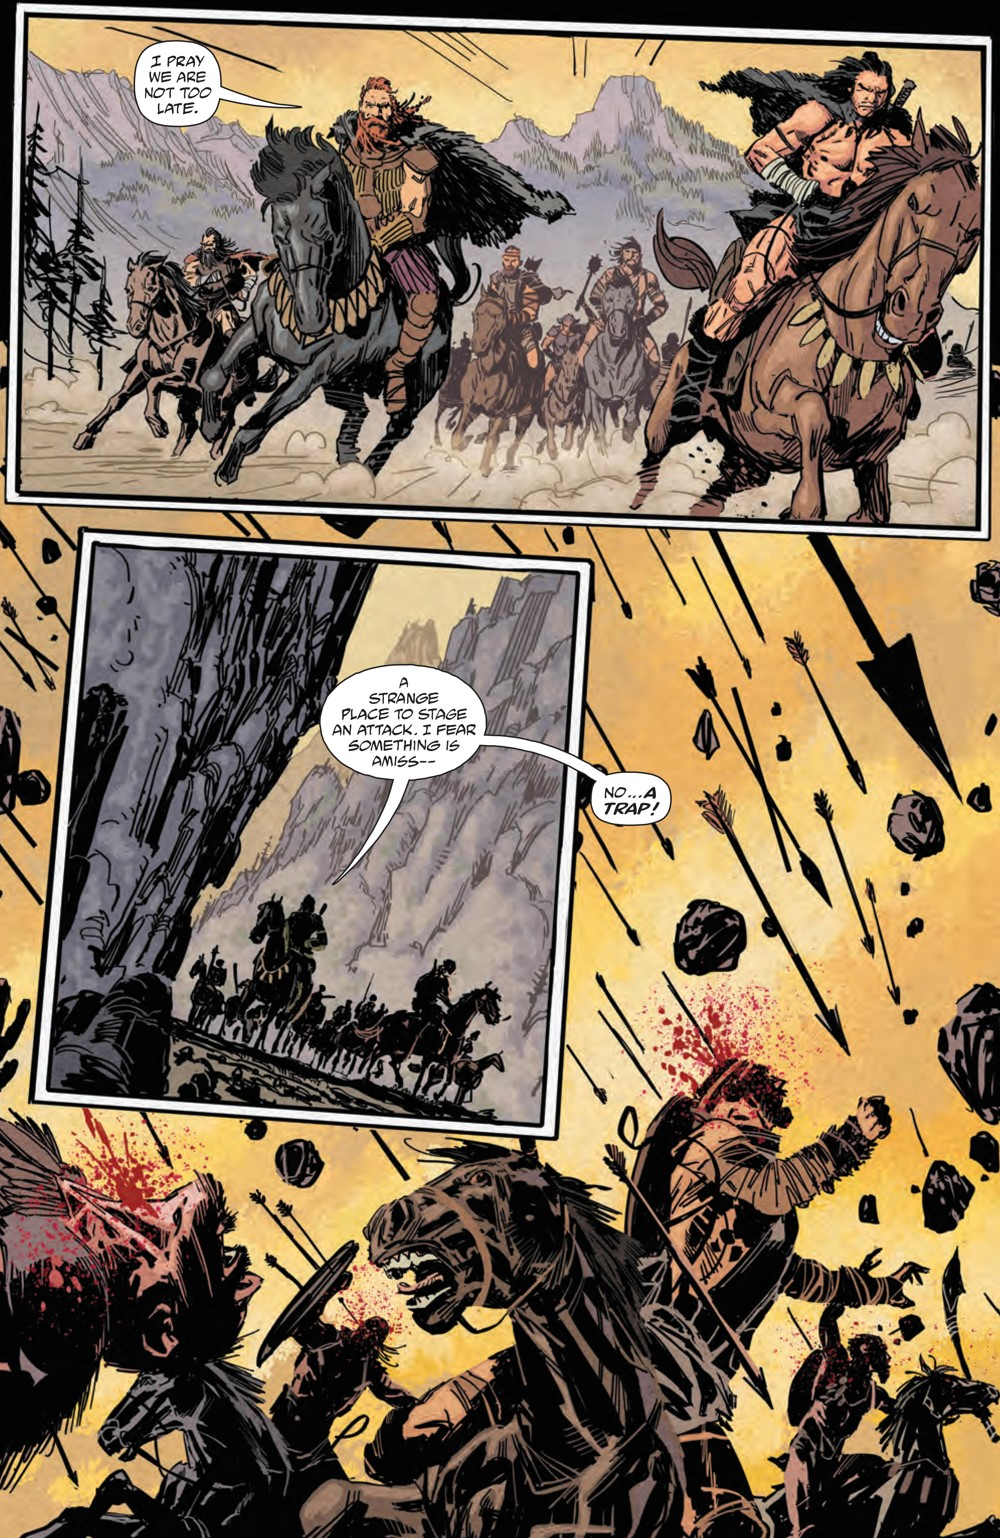 BRZRKR_004_PRESS_7 ComicList Previews: BRZRKR #4 (OF 12)